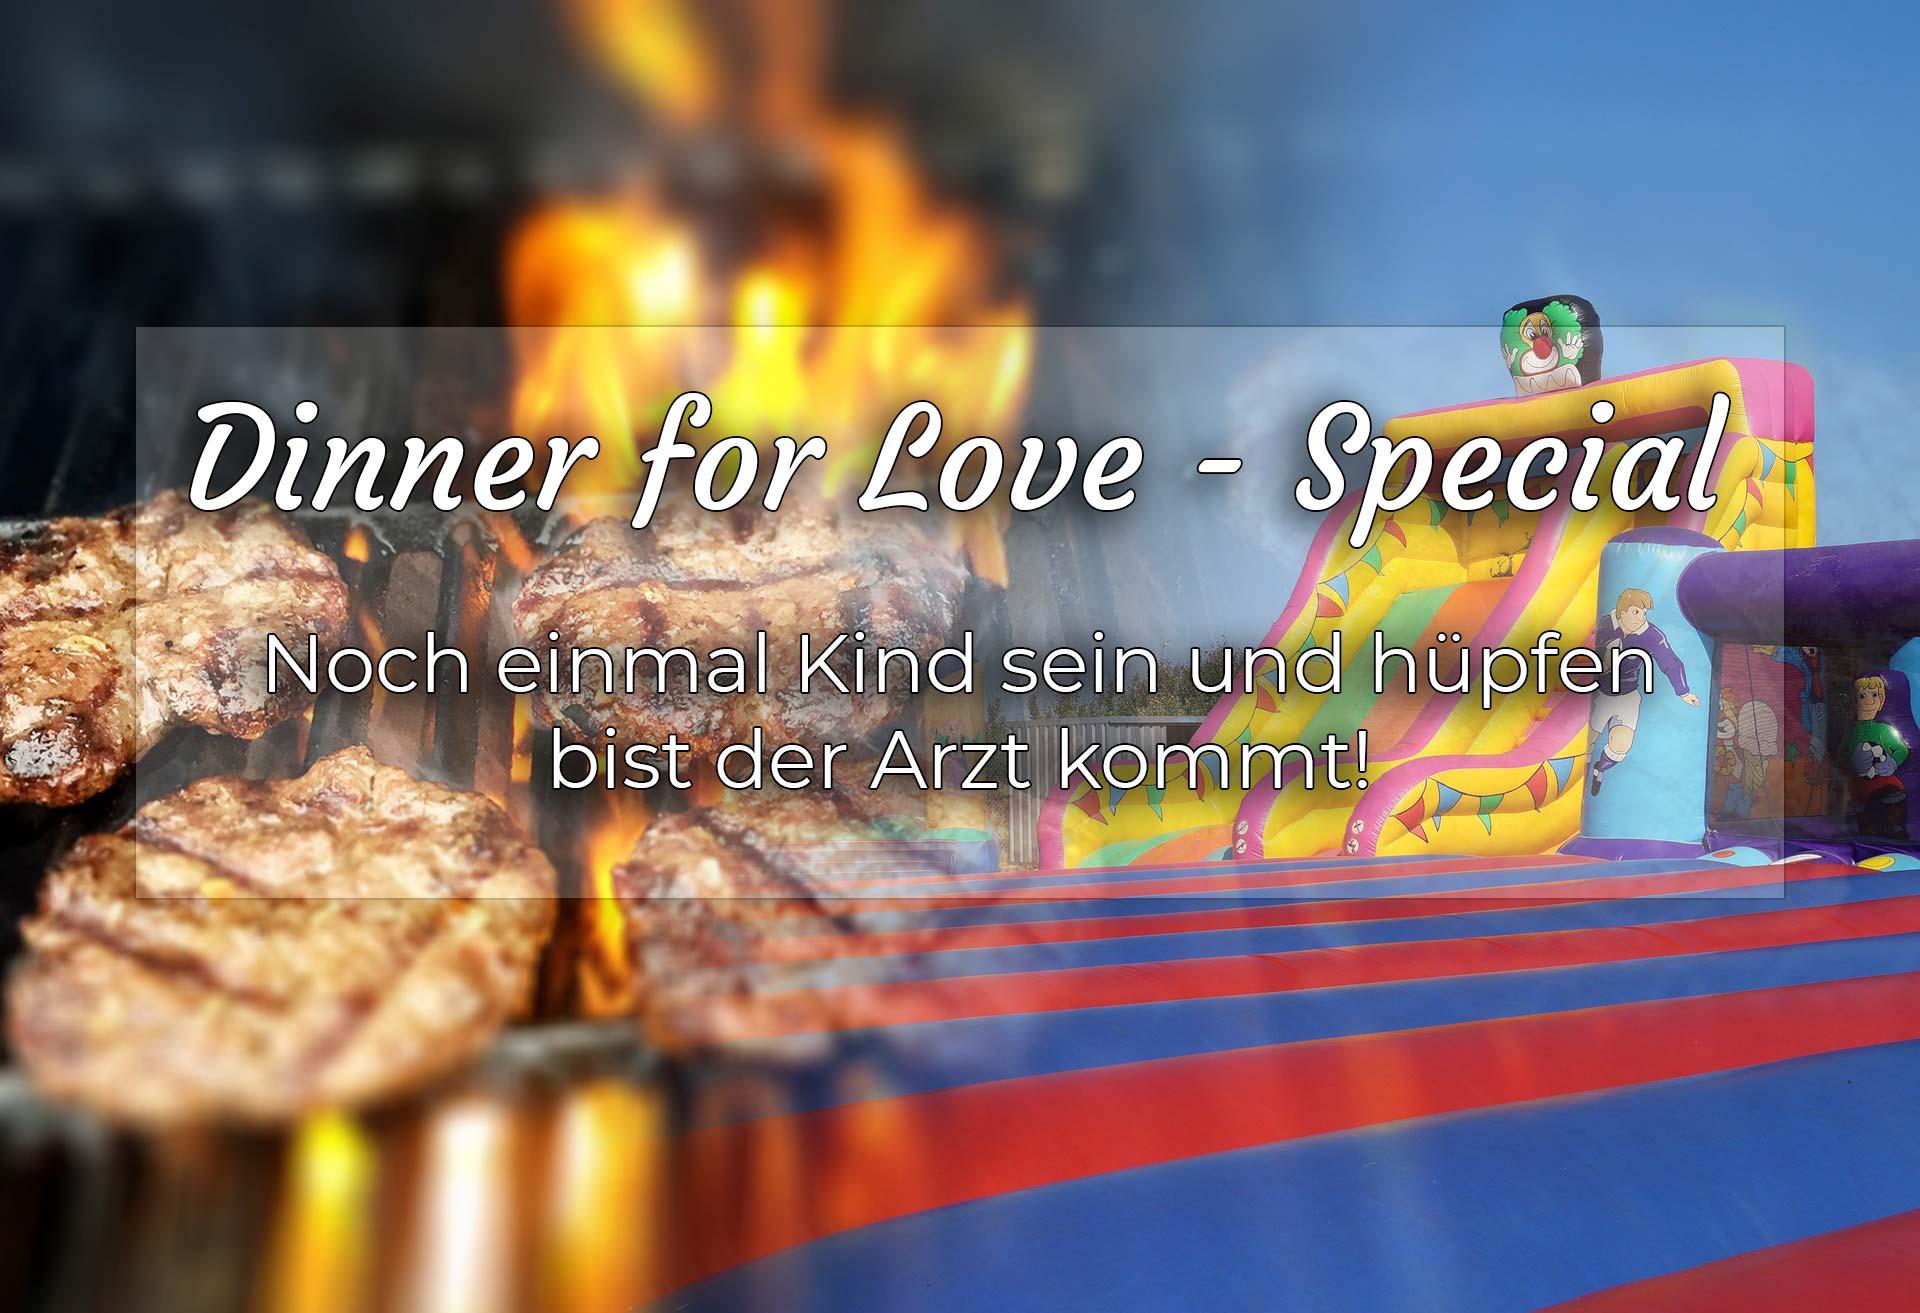 Special-Event-Dinnerforlove